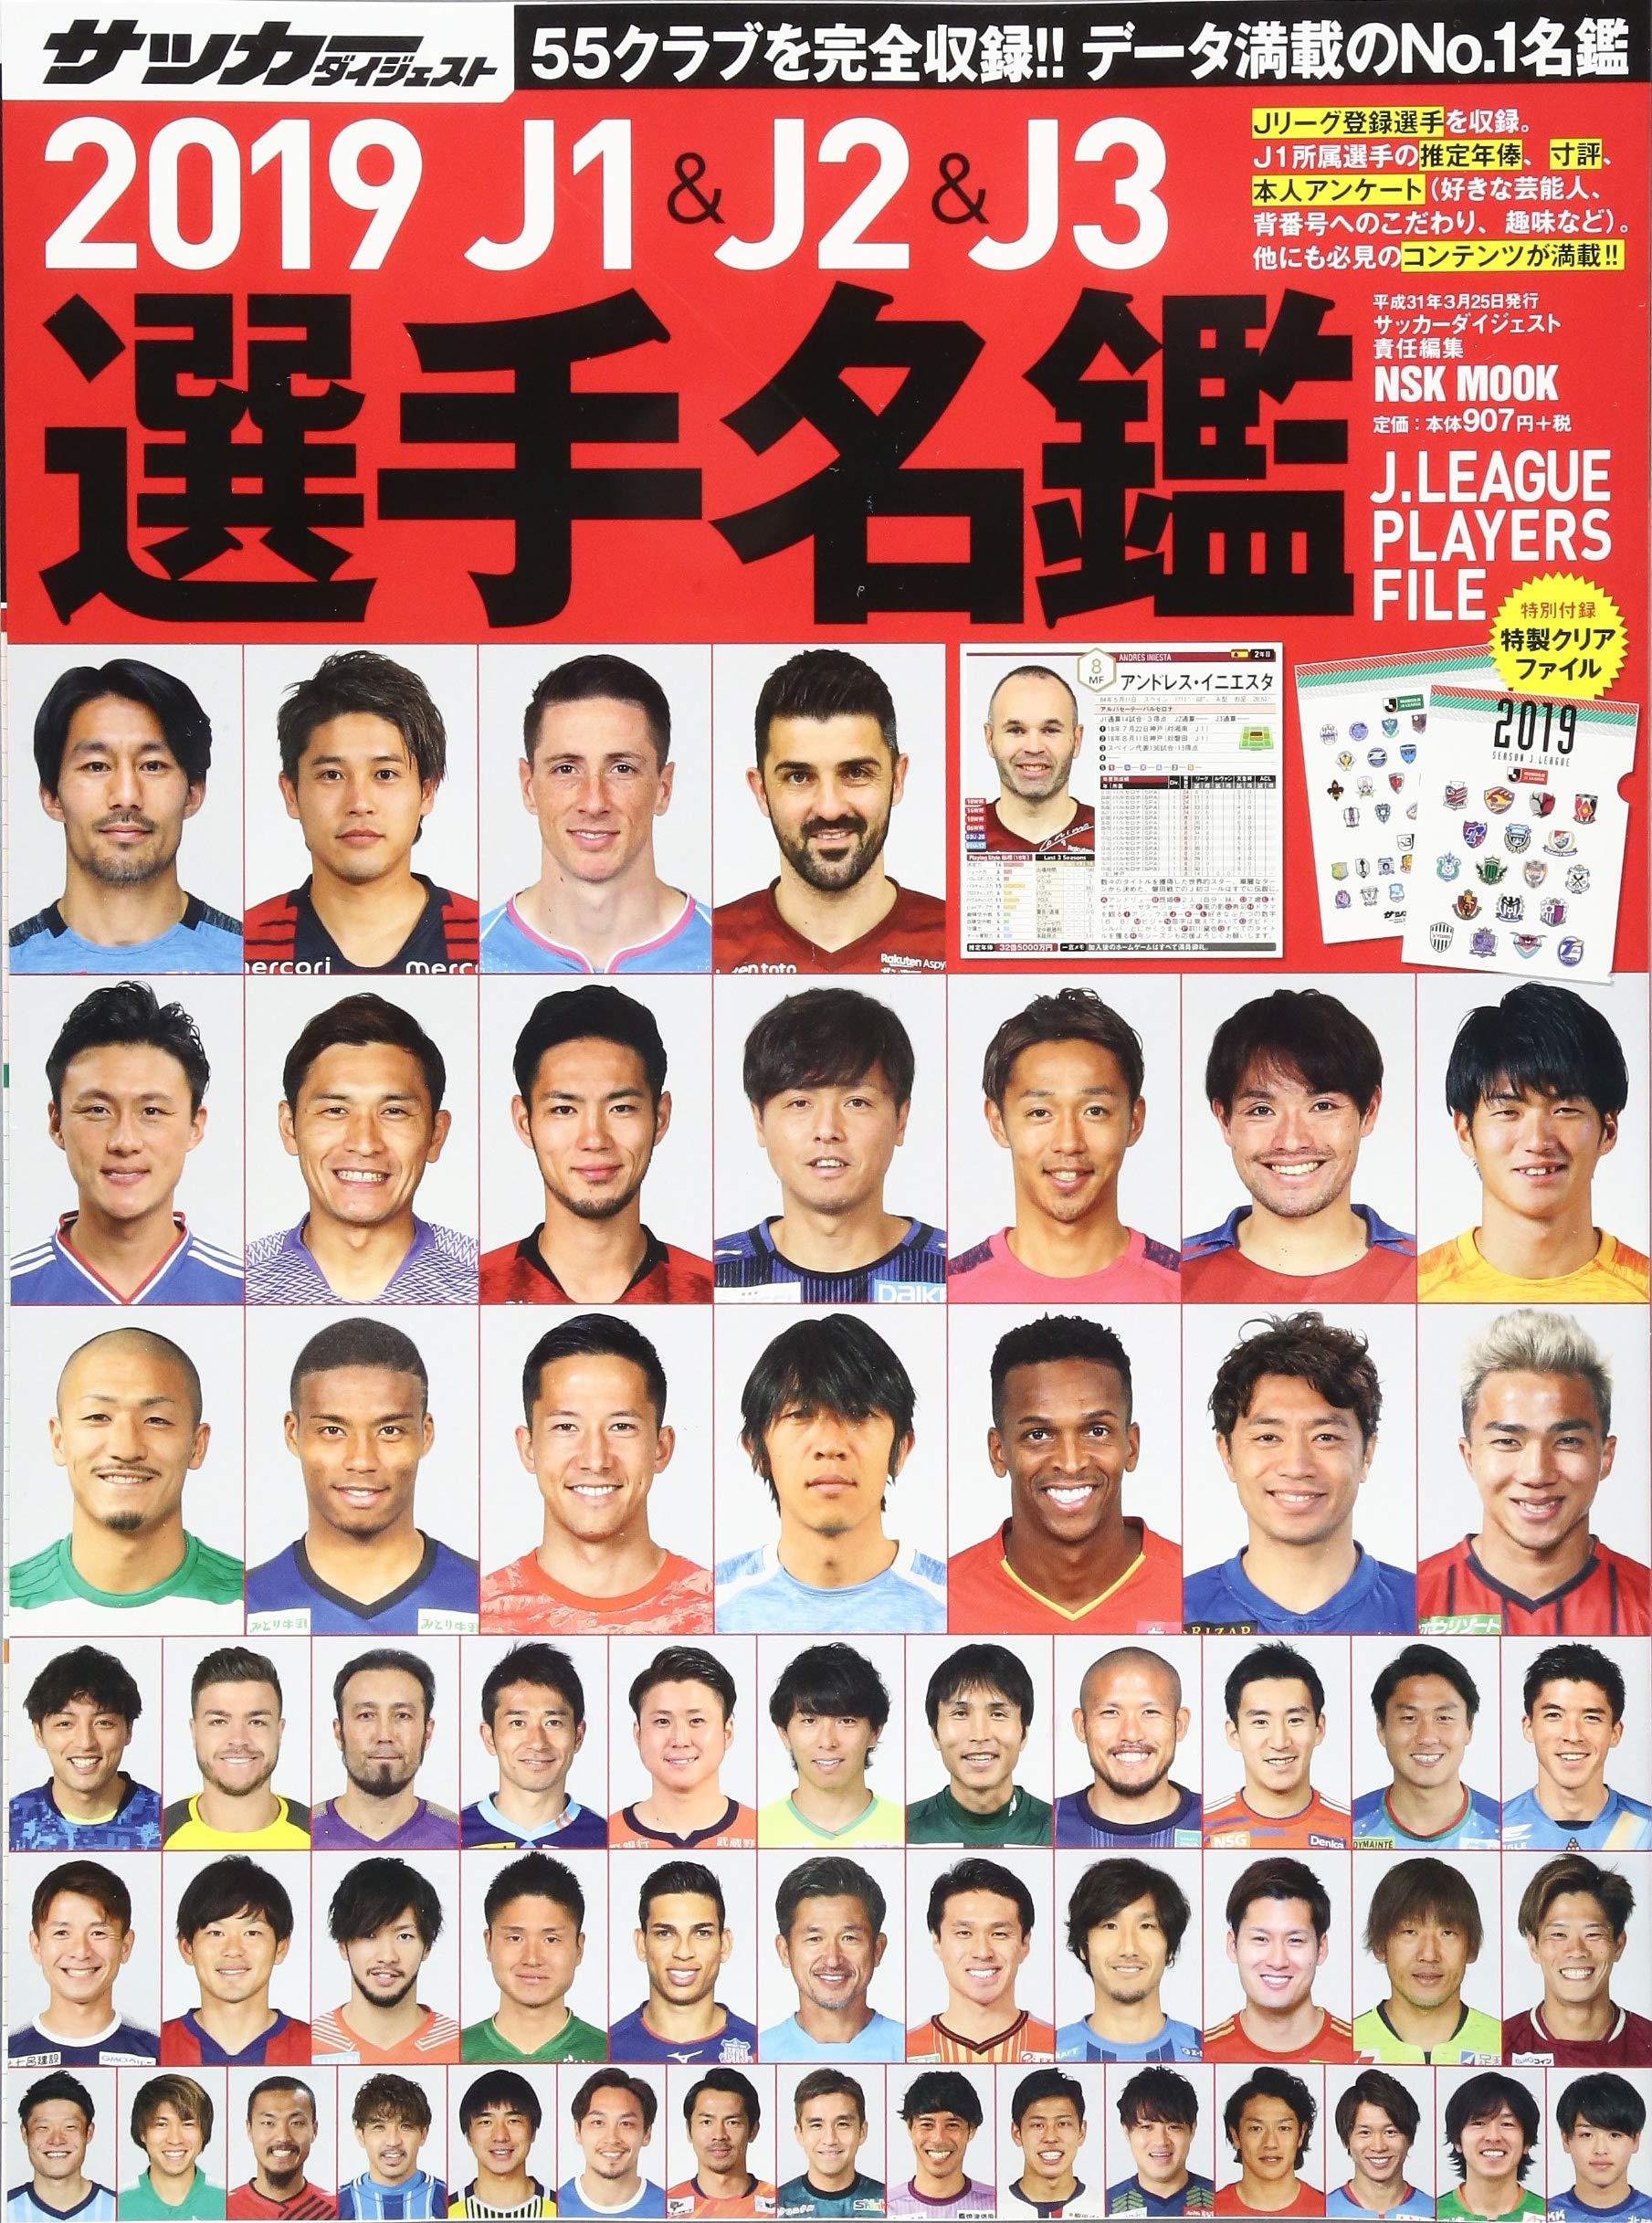 J リーグ 選手 名鑑 Jリーグ選手名鑑2021 J1・J2・J3